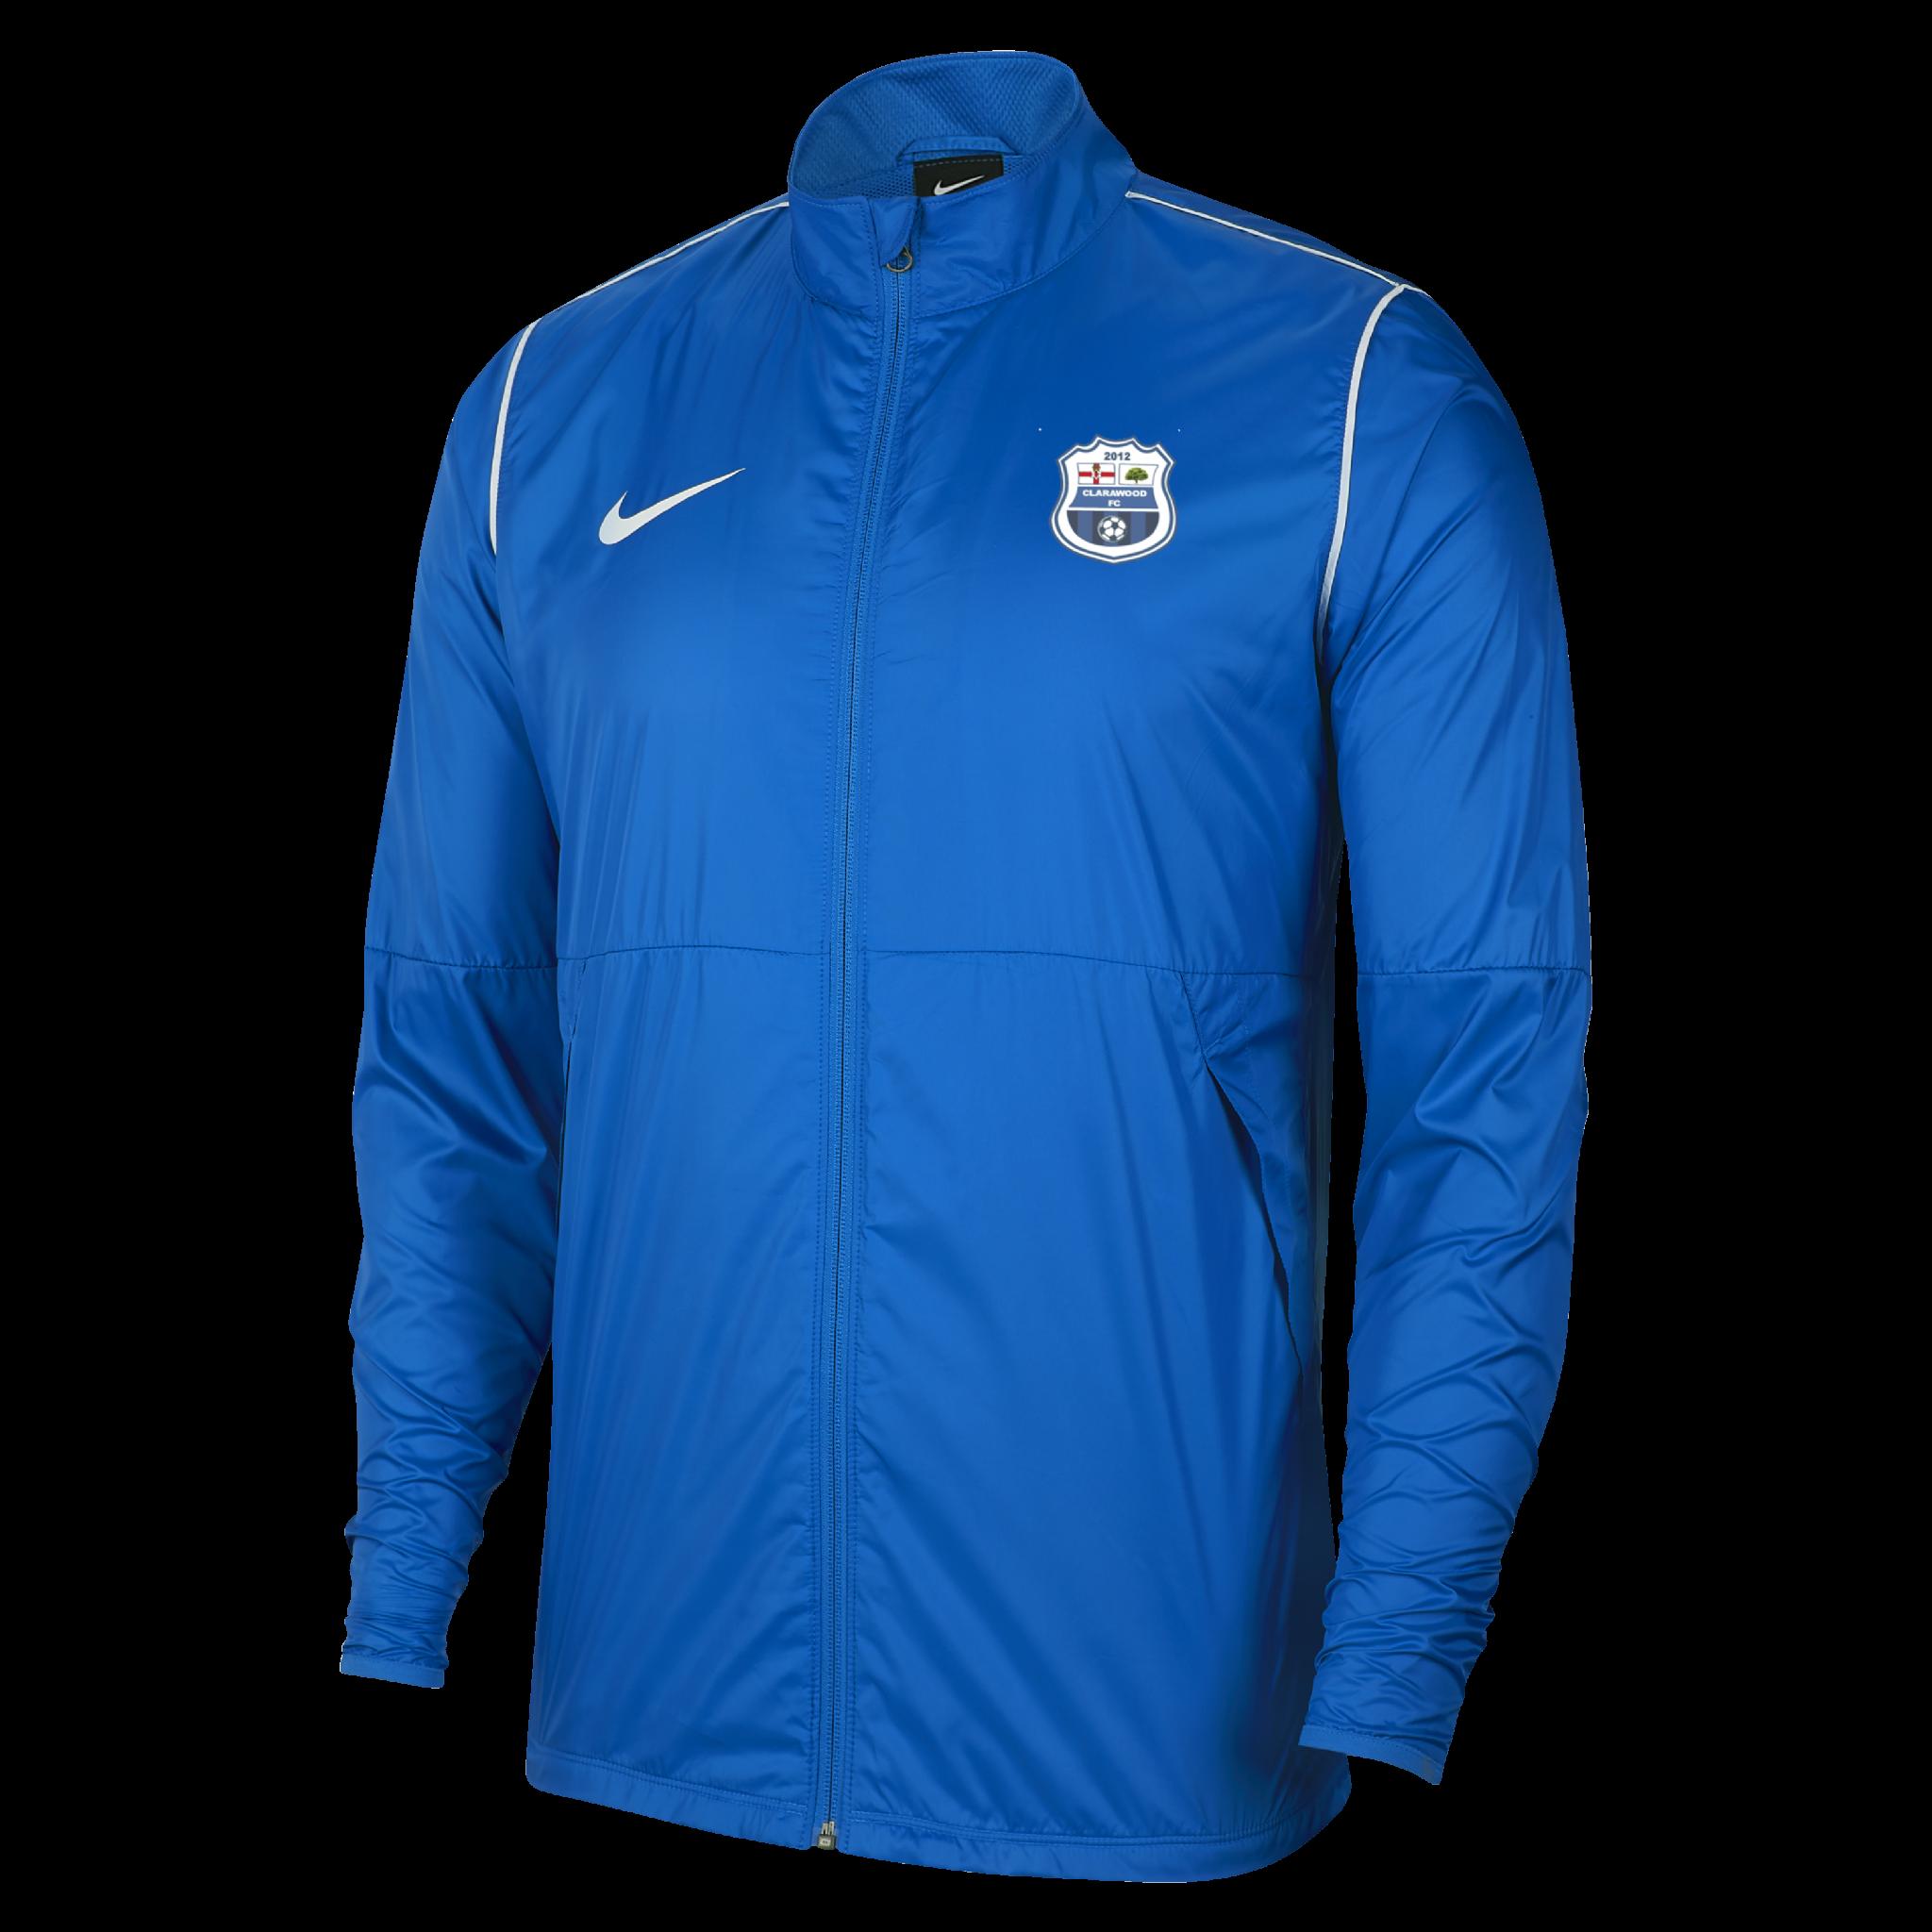 clarawood fc players rain jacket 36416 1 p